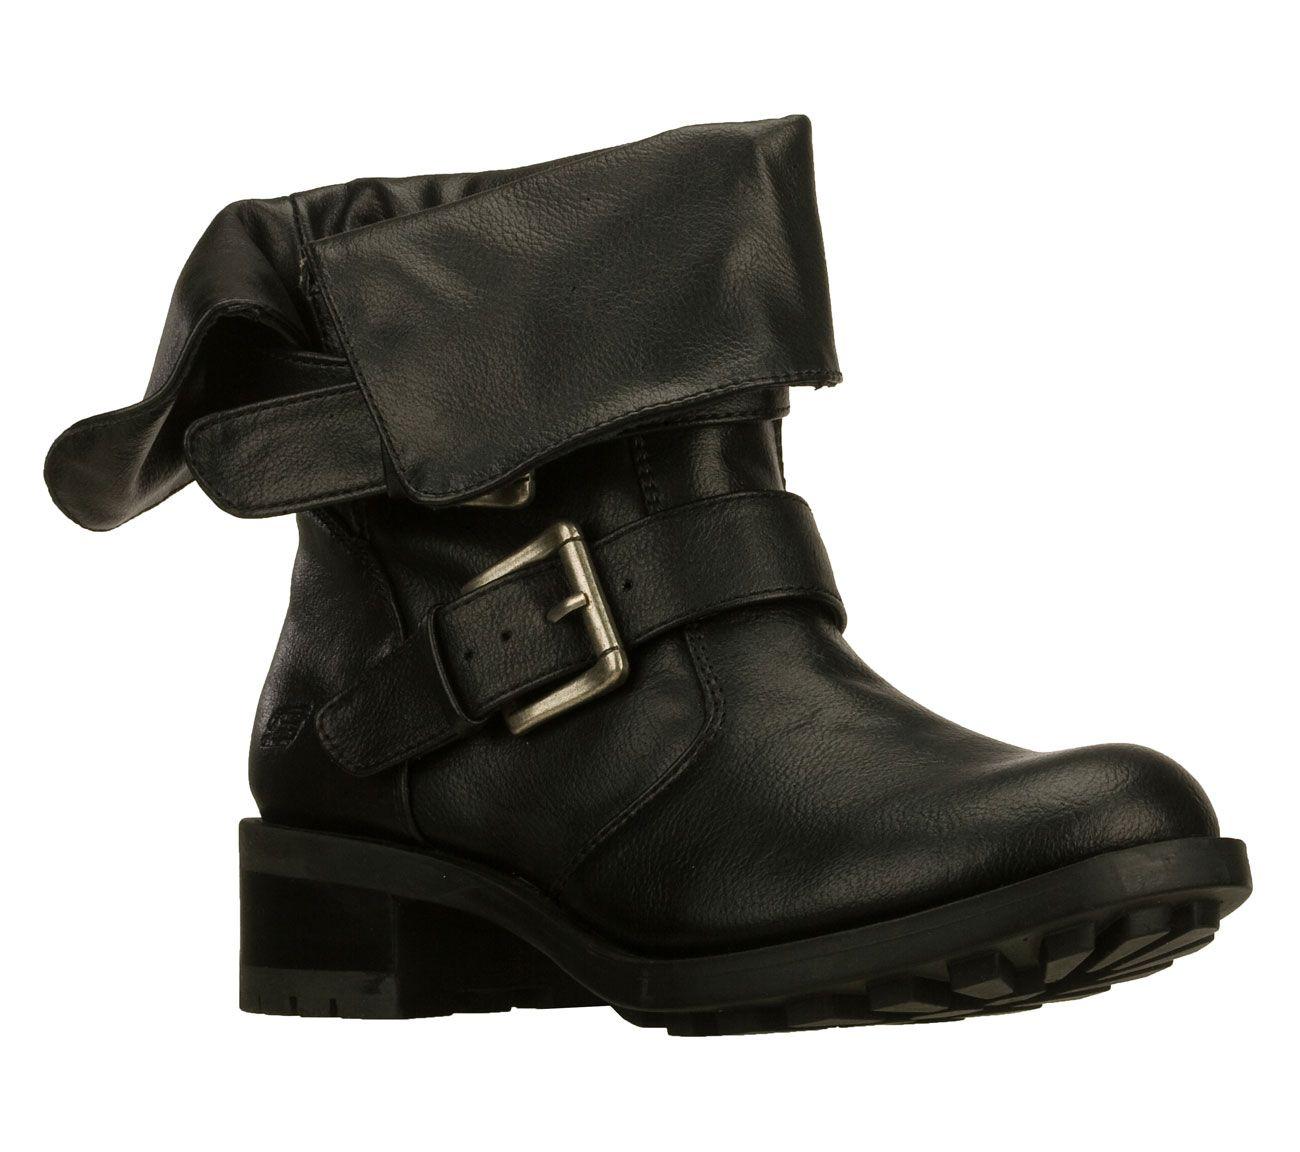 Boots, Black biker boots